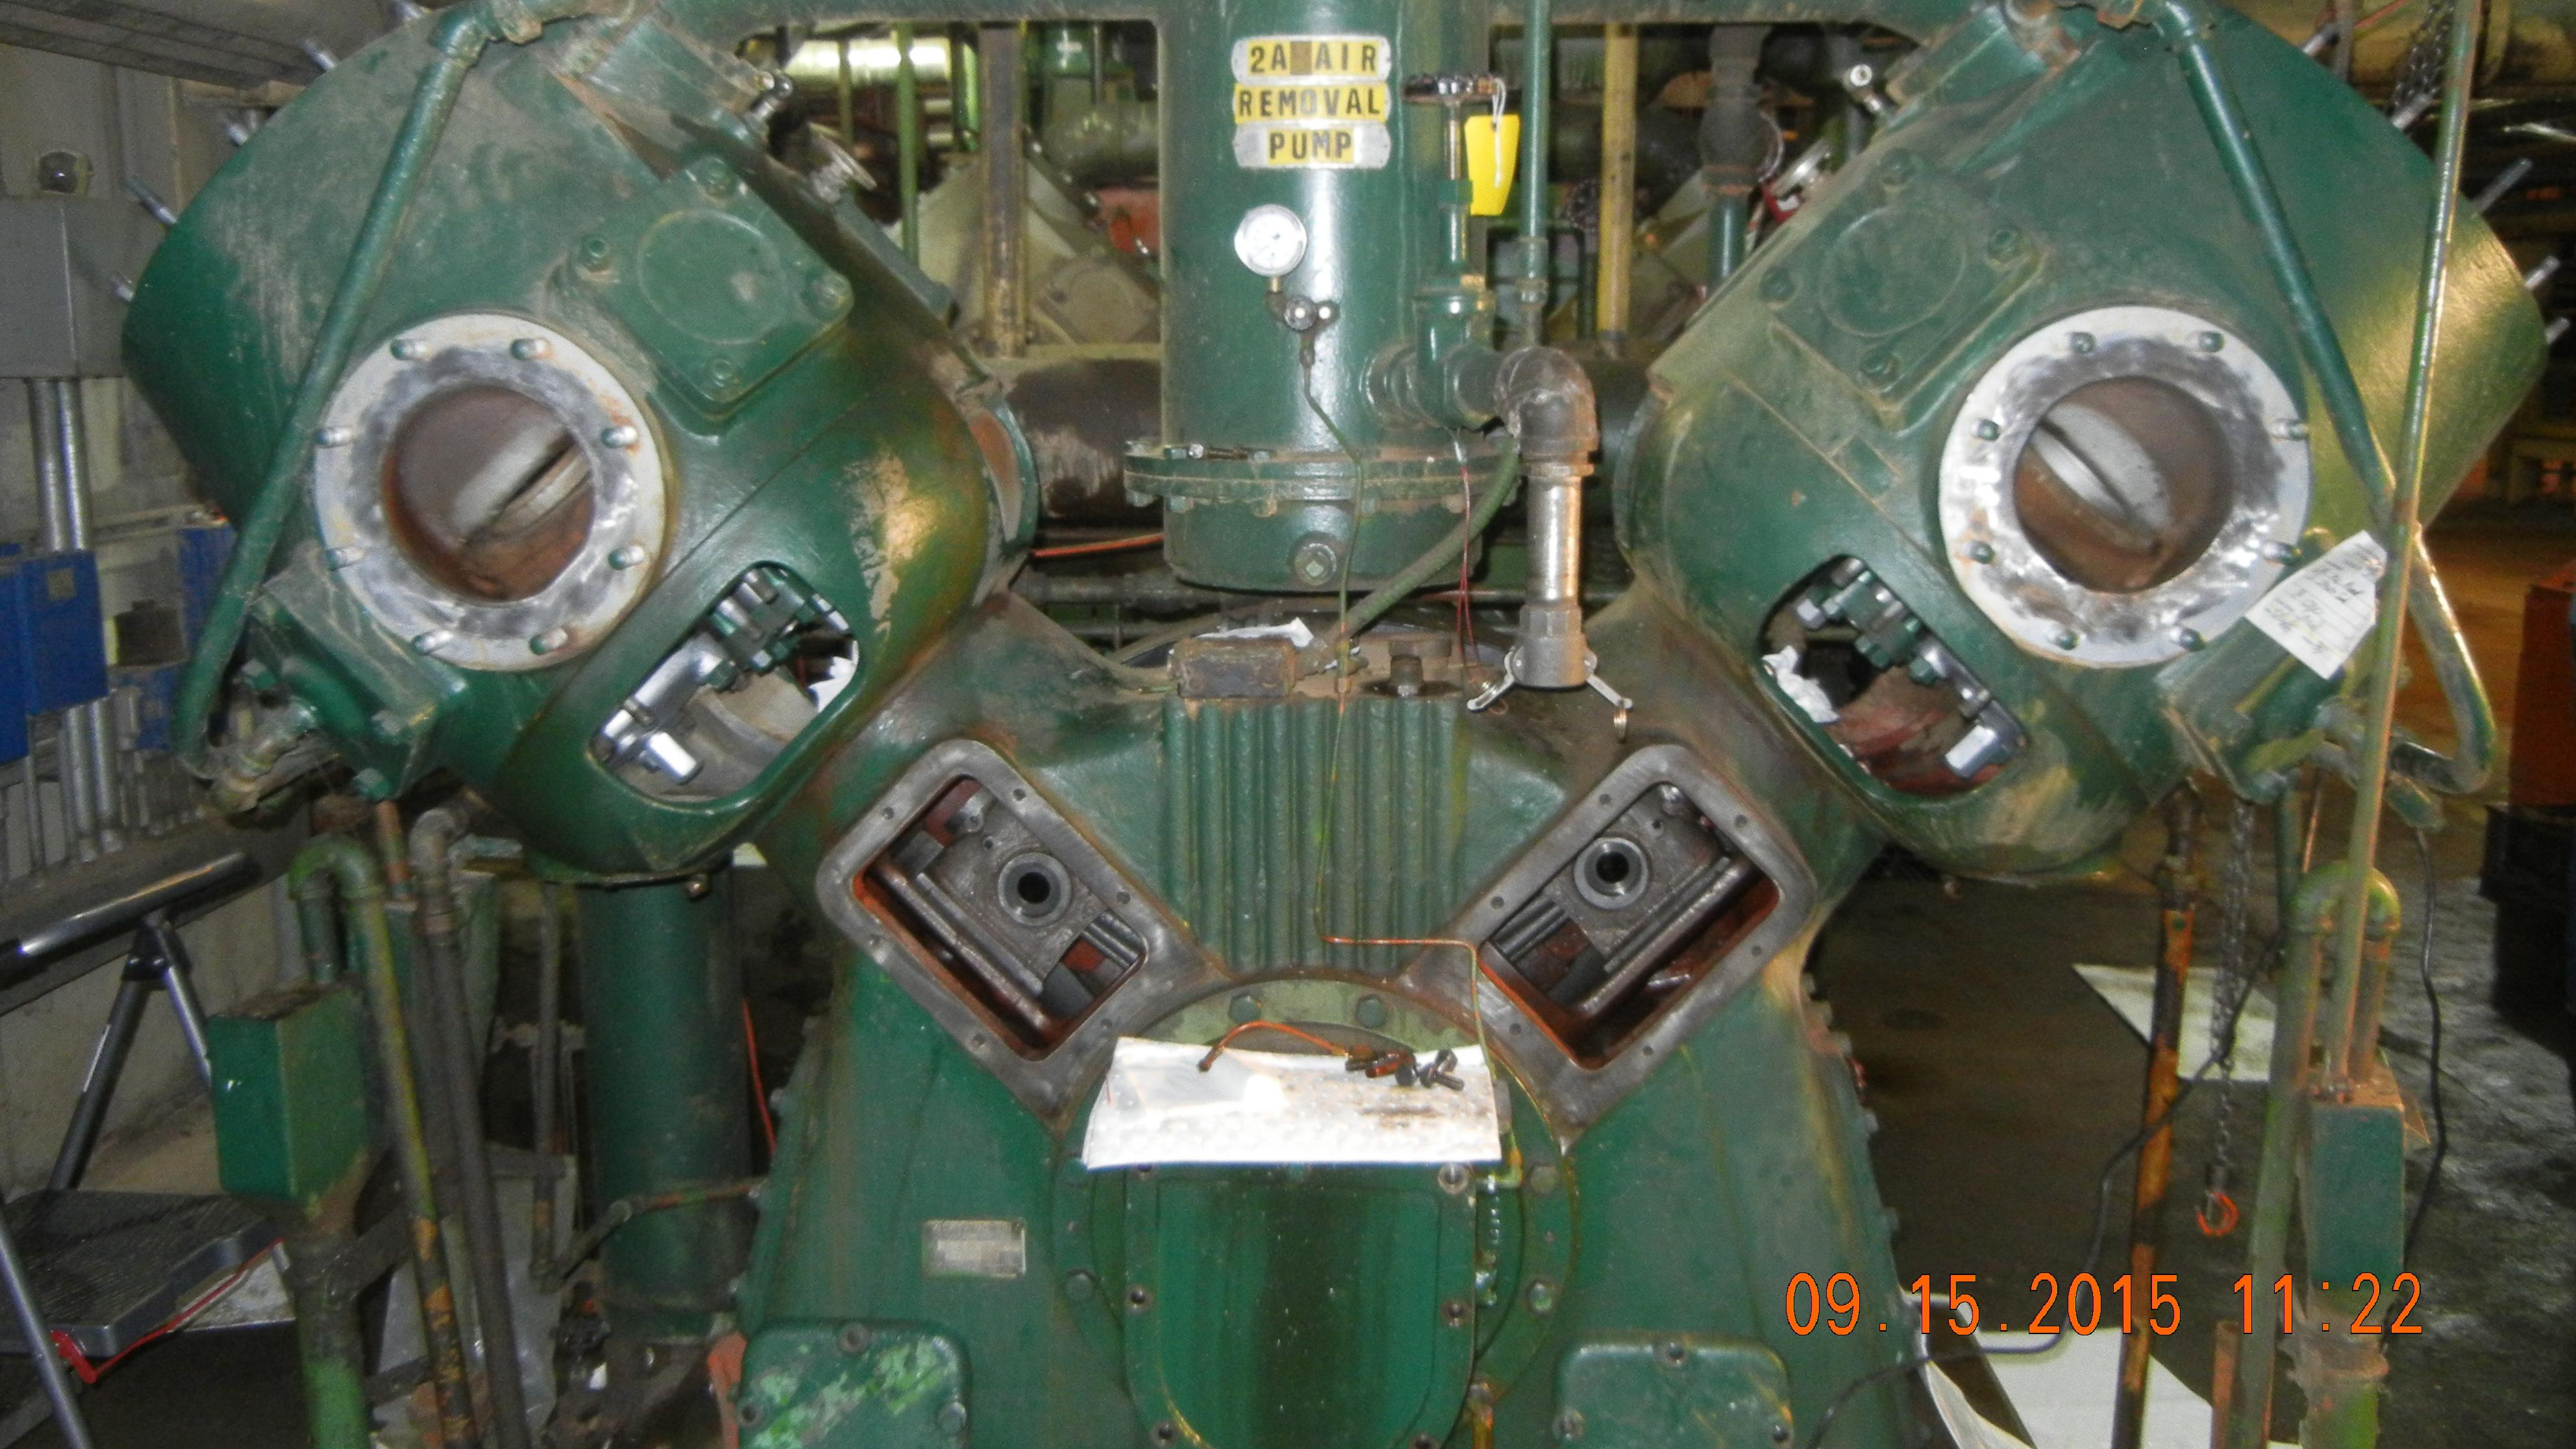 Worthington Compressor Division image 1